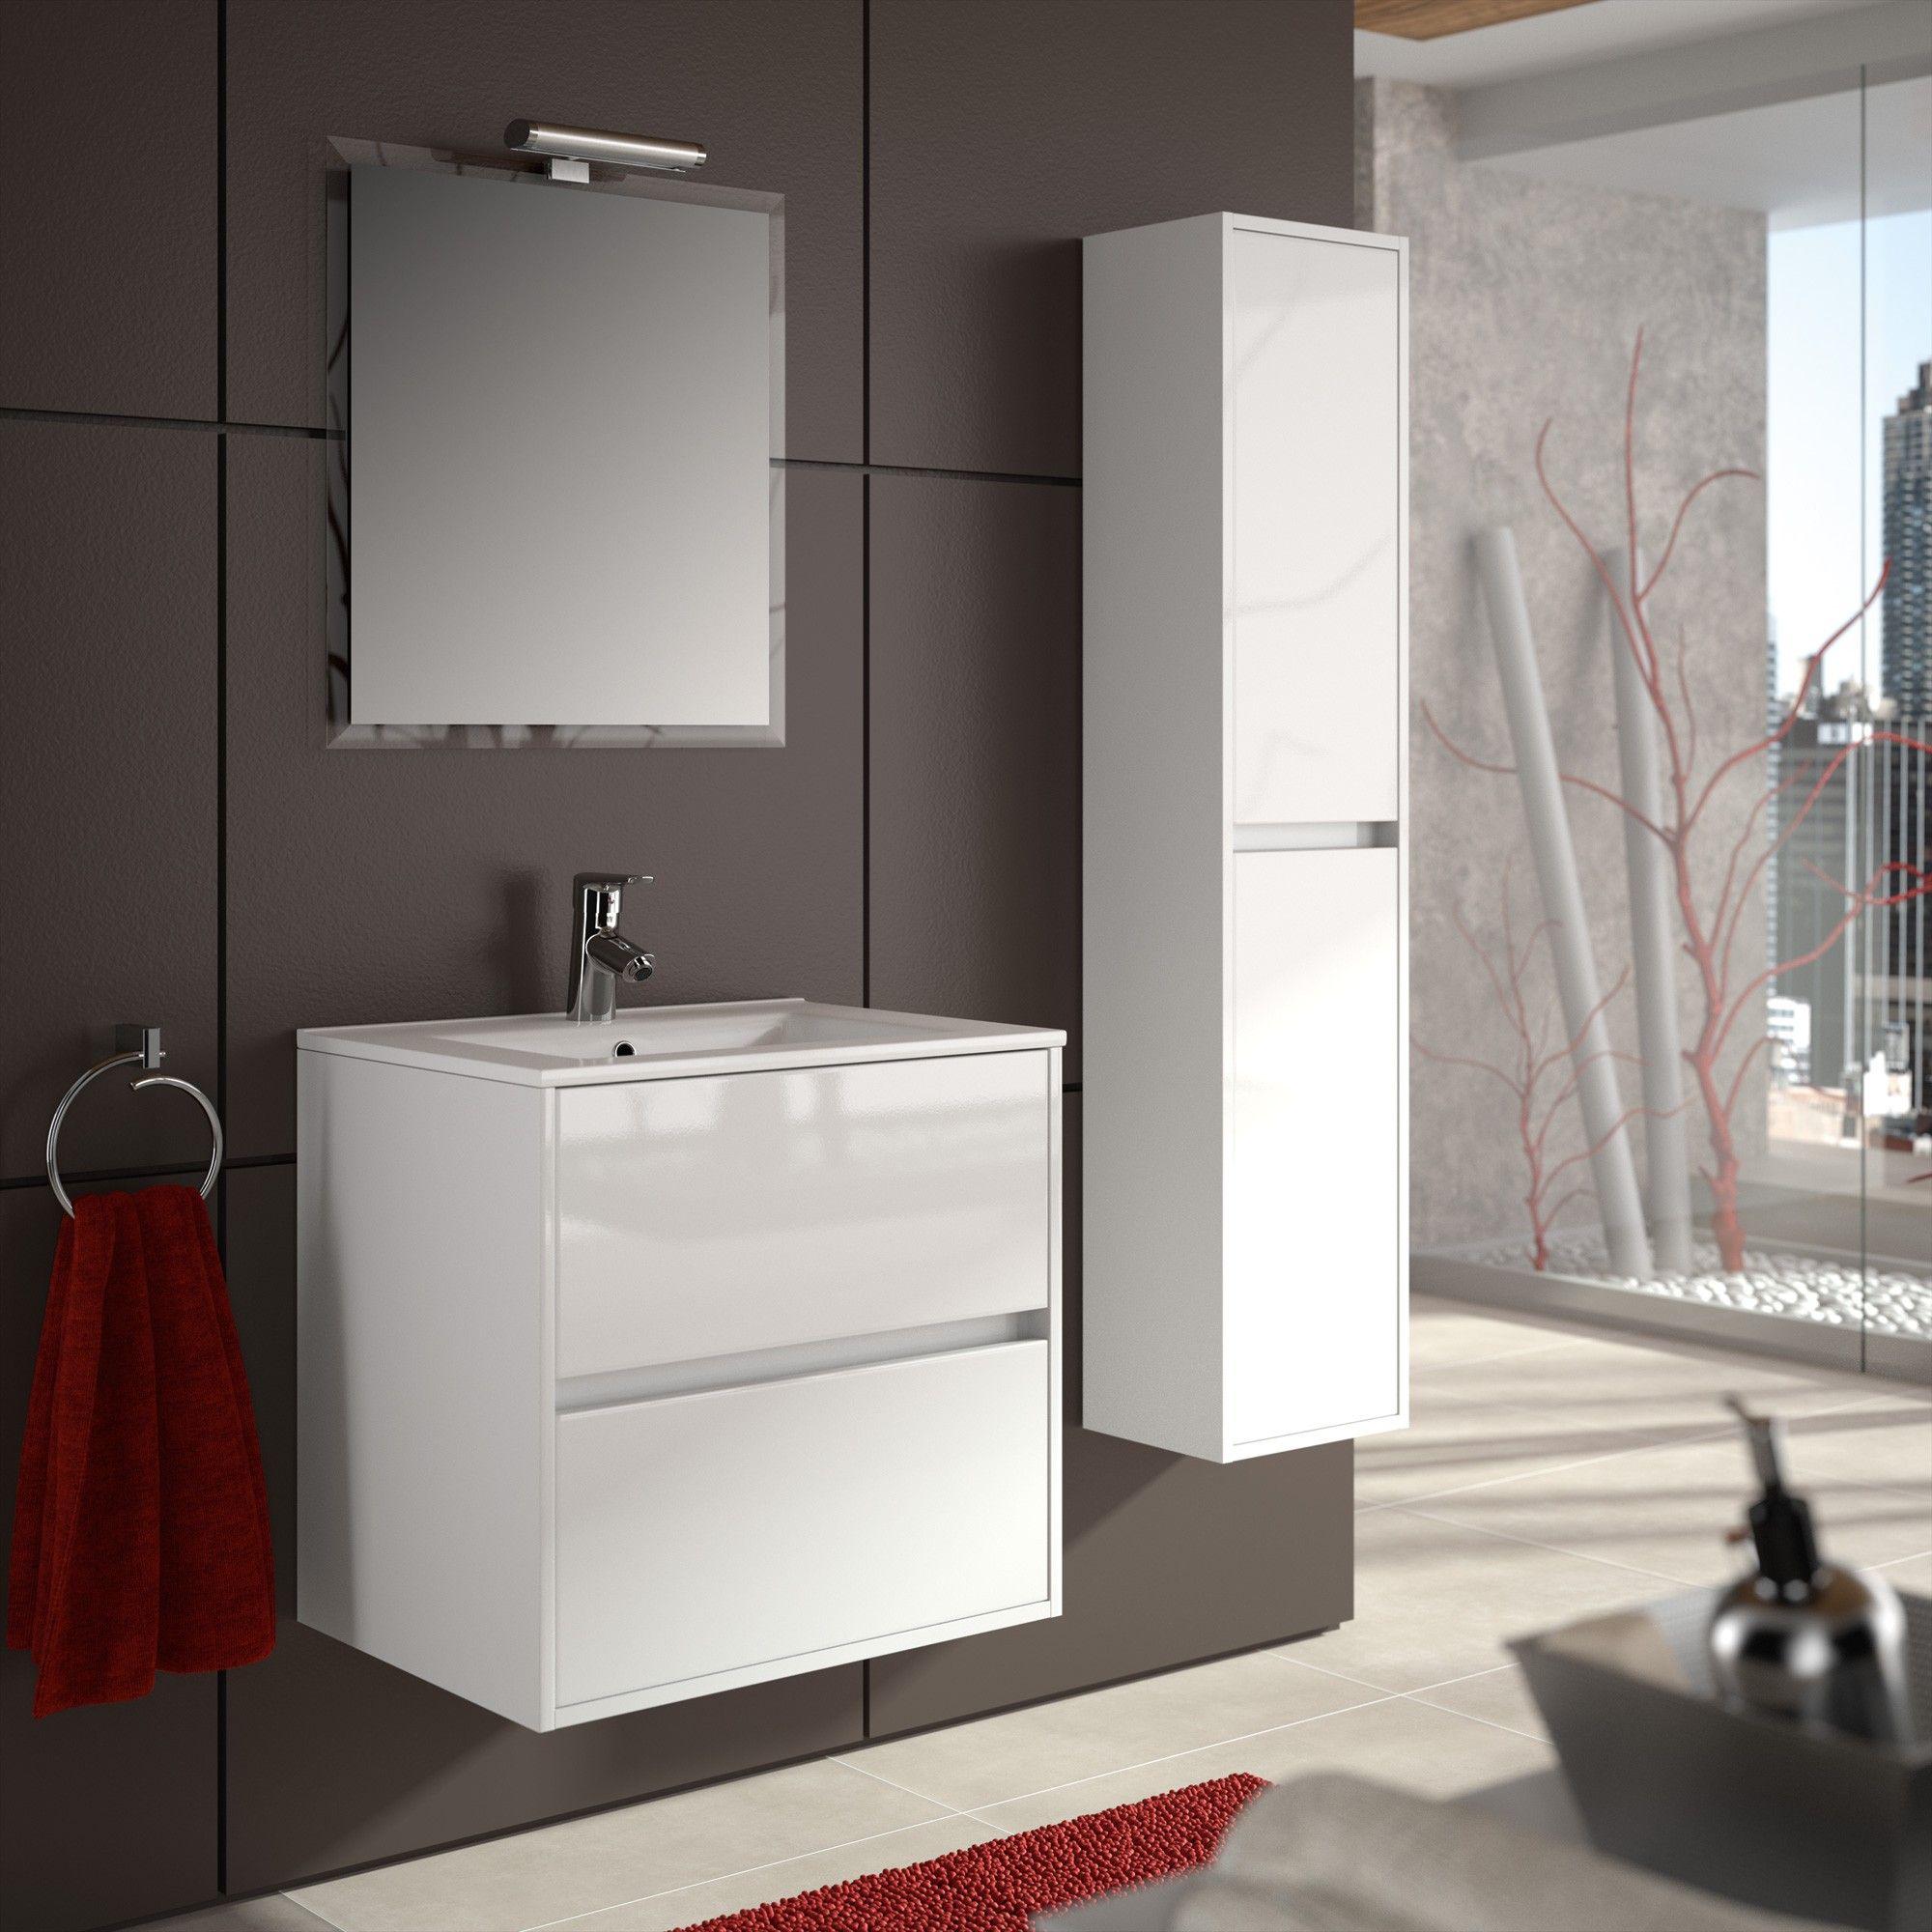 Pin by techno conseil bain douche on meuble salle de bain - Meuble de salle de bain brico depot ...